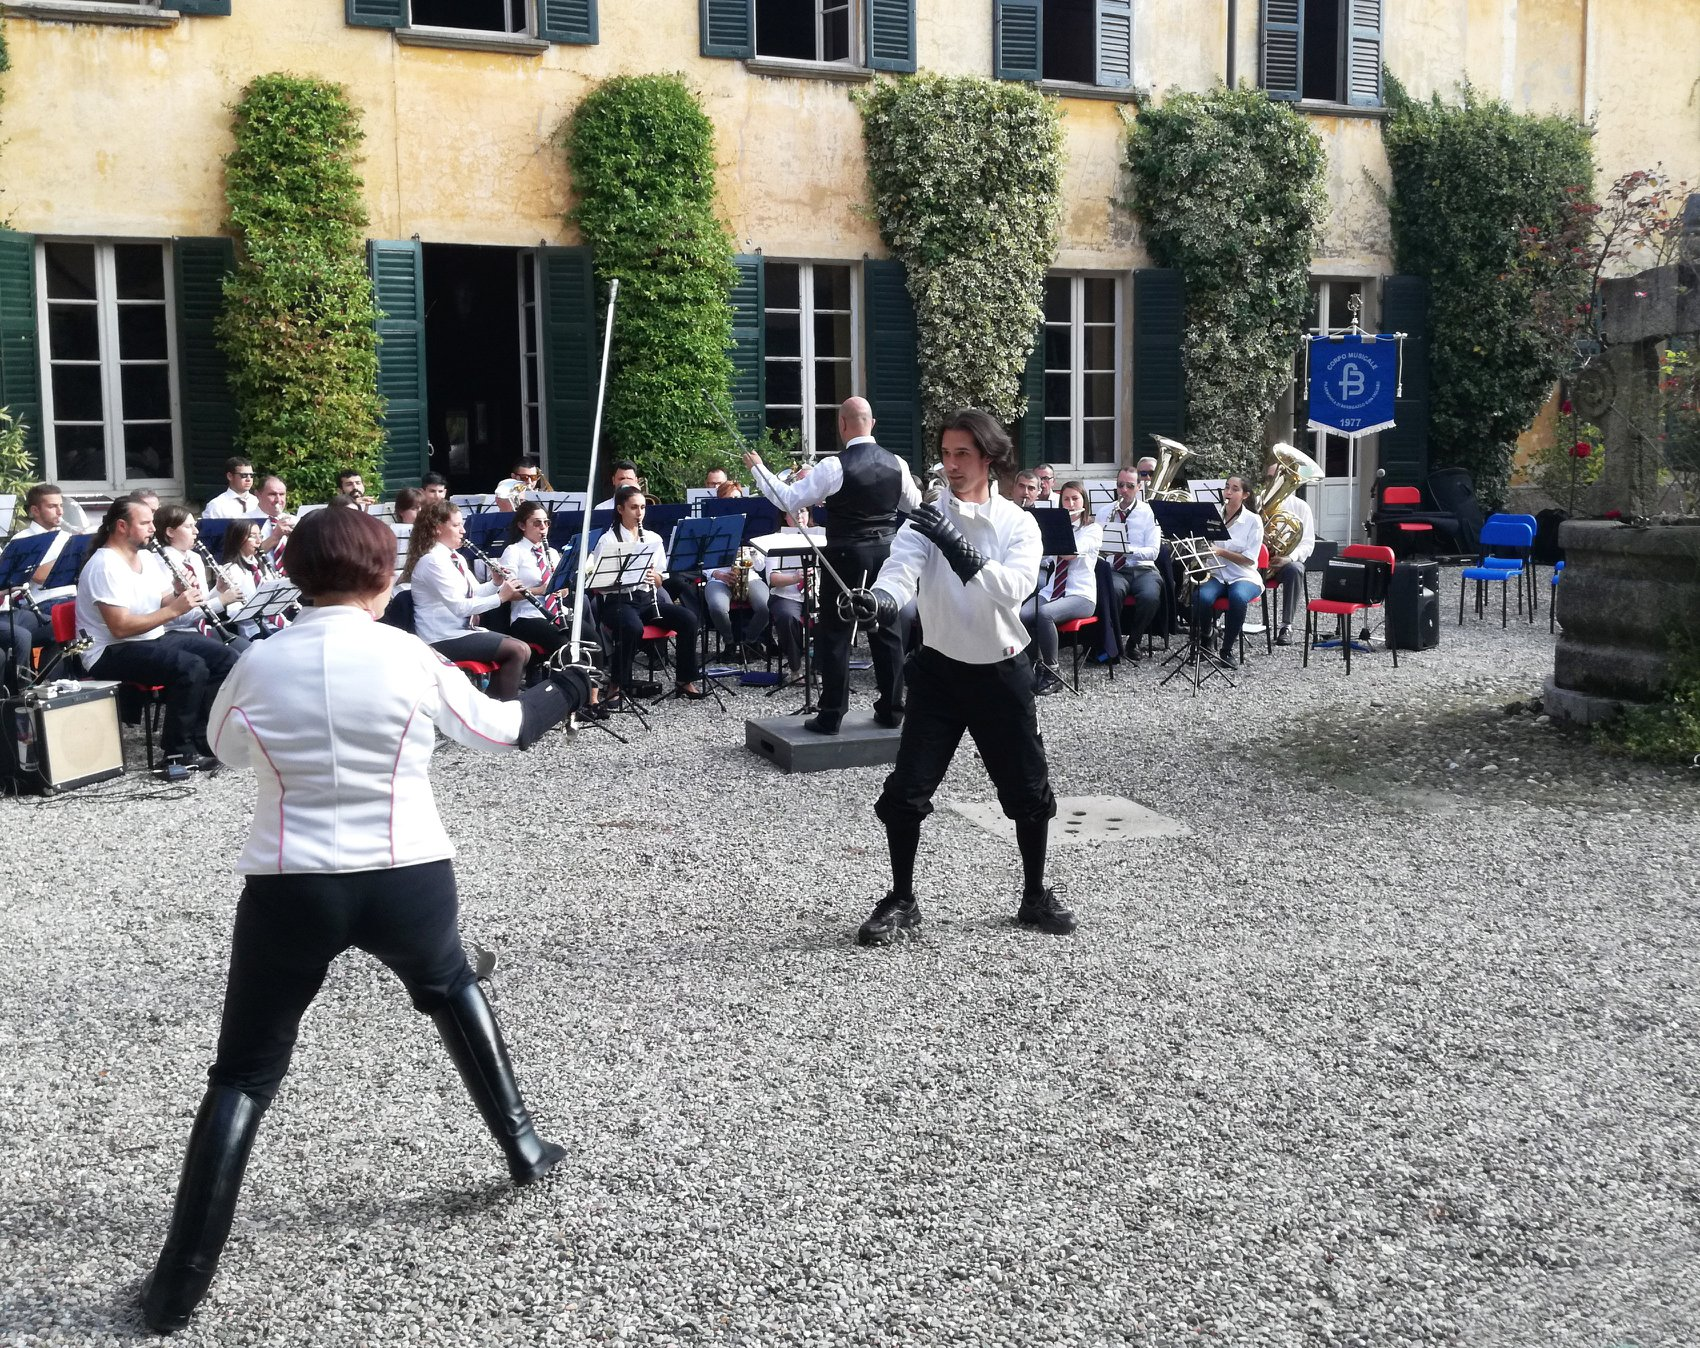 23 set 17 - Aperitivo & Musica in Villa Reina - Ars Gladii 01